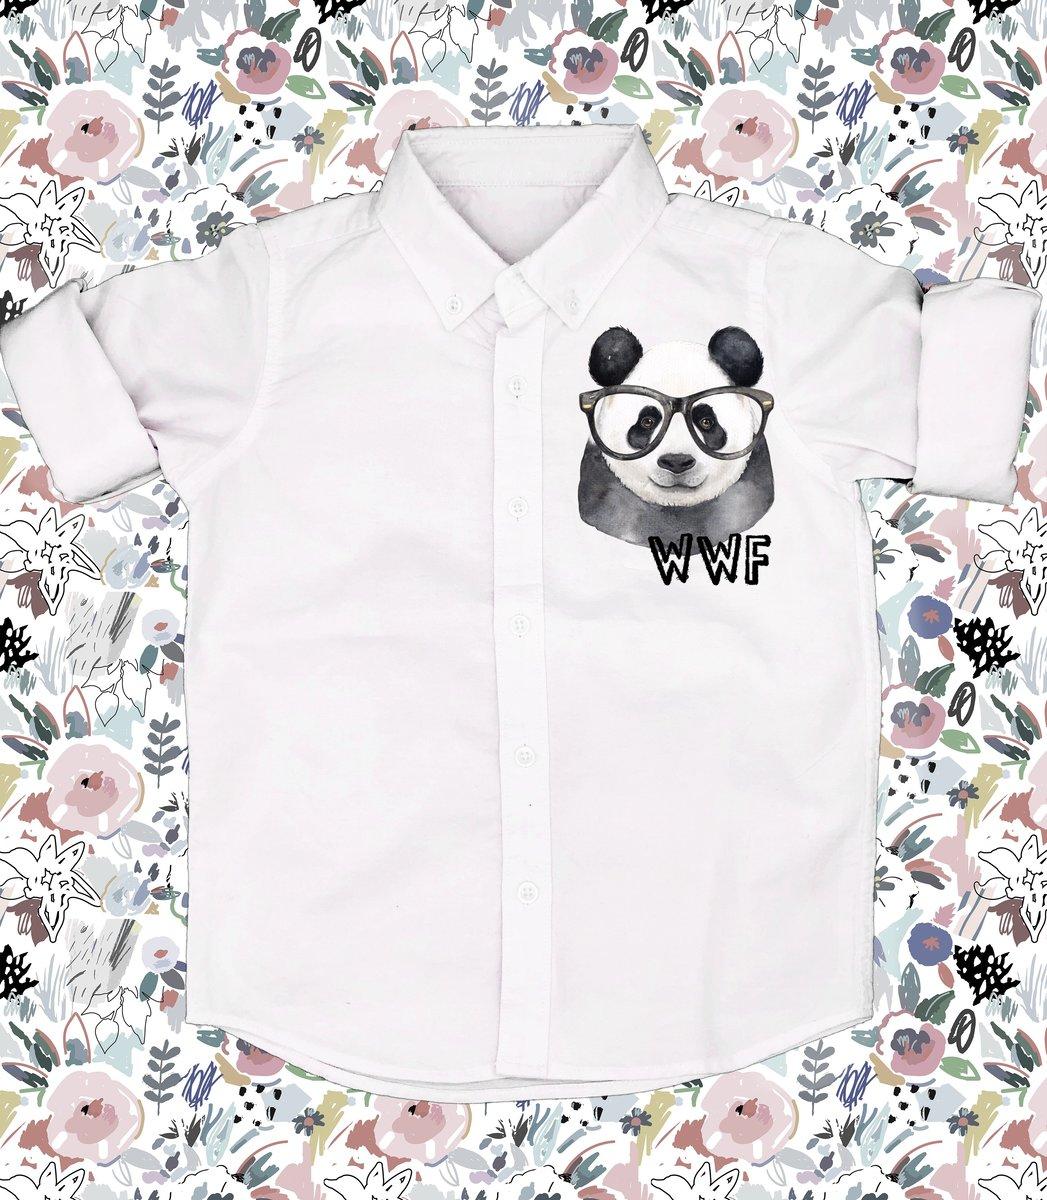 Printed Woven Shirt - PANDA